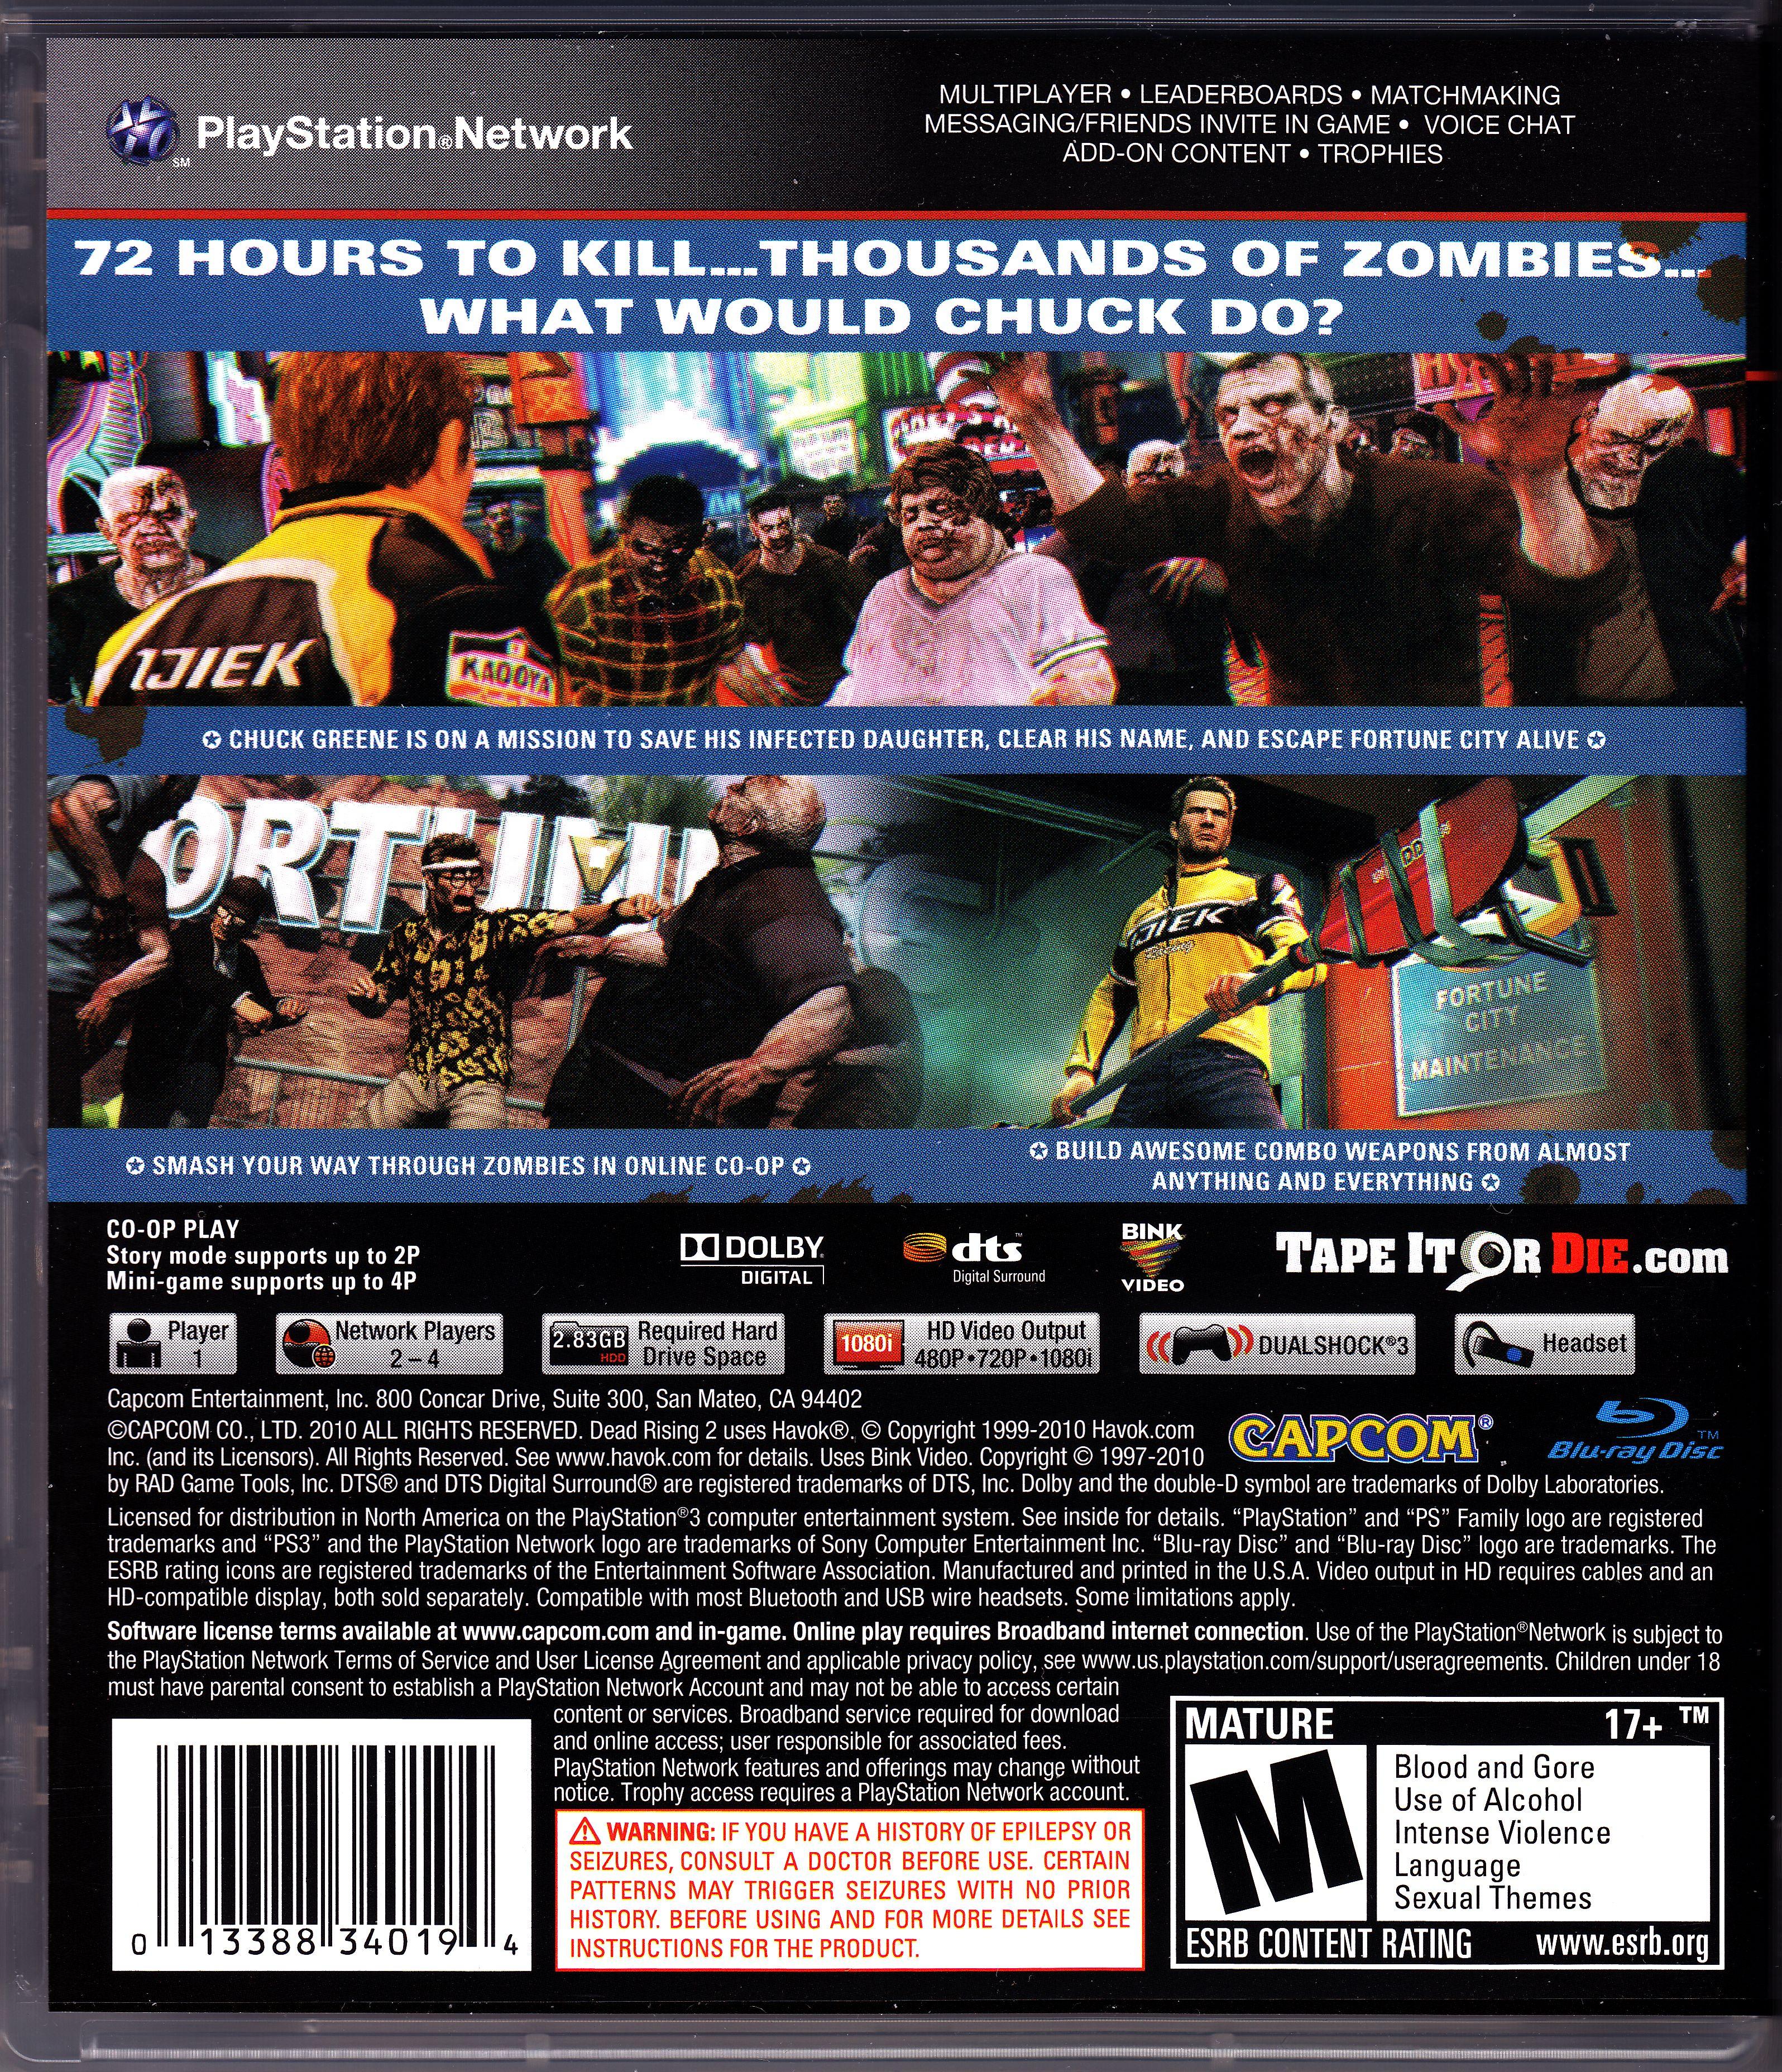 Dead rising 2 cheats gamespot.